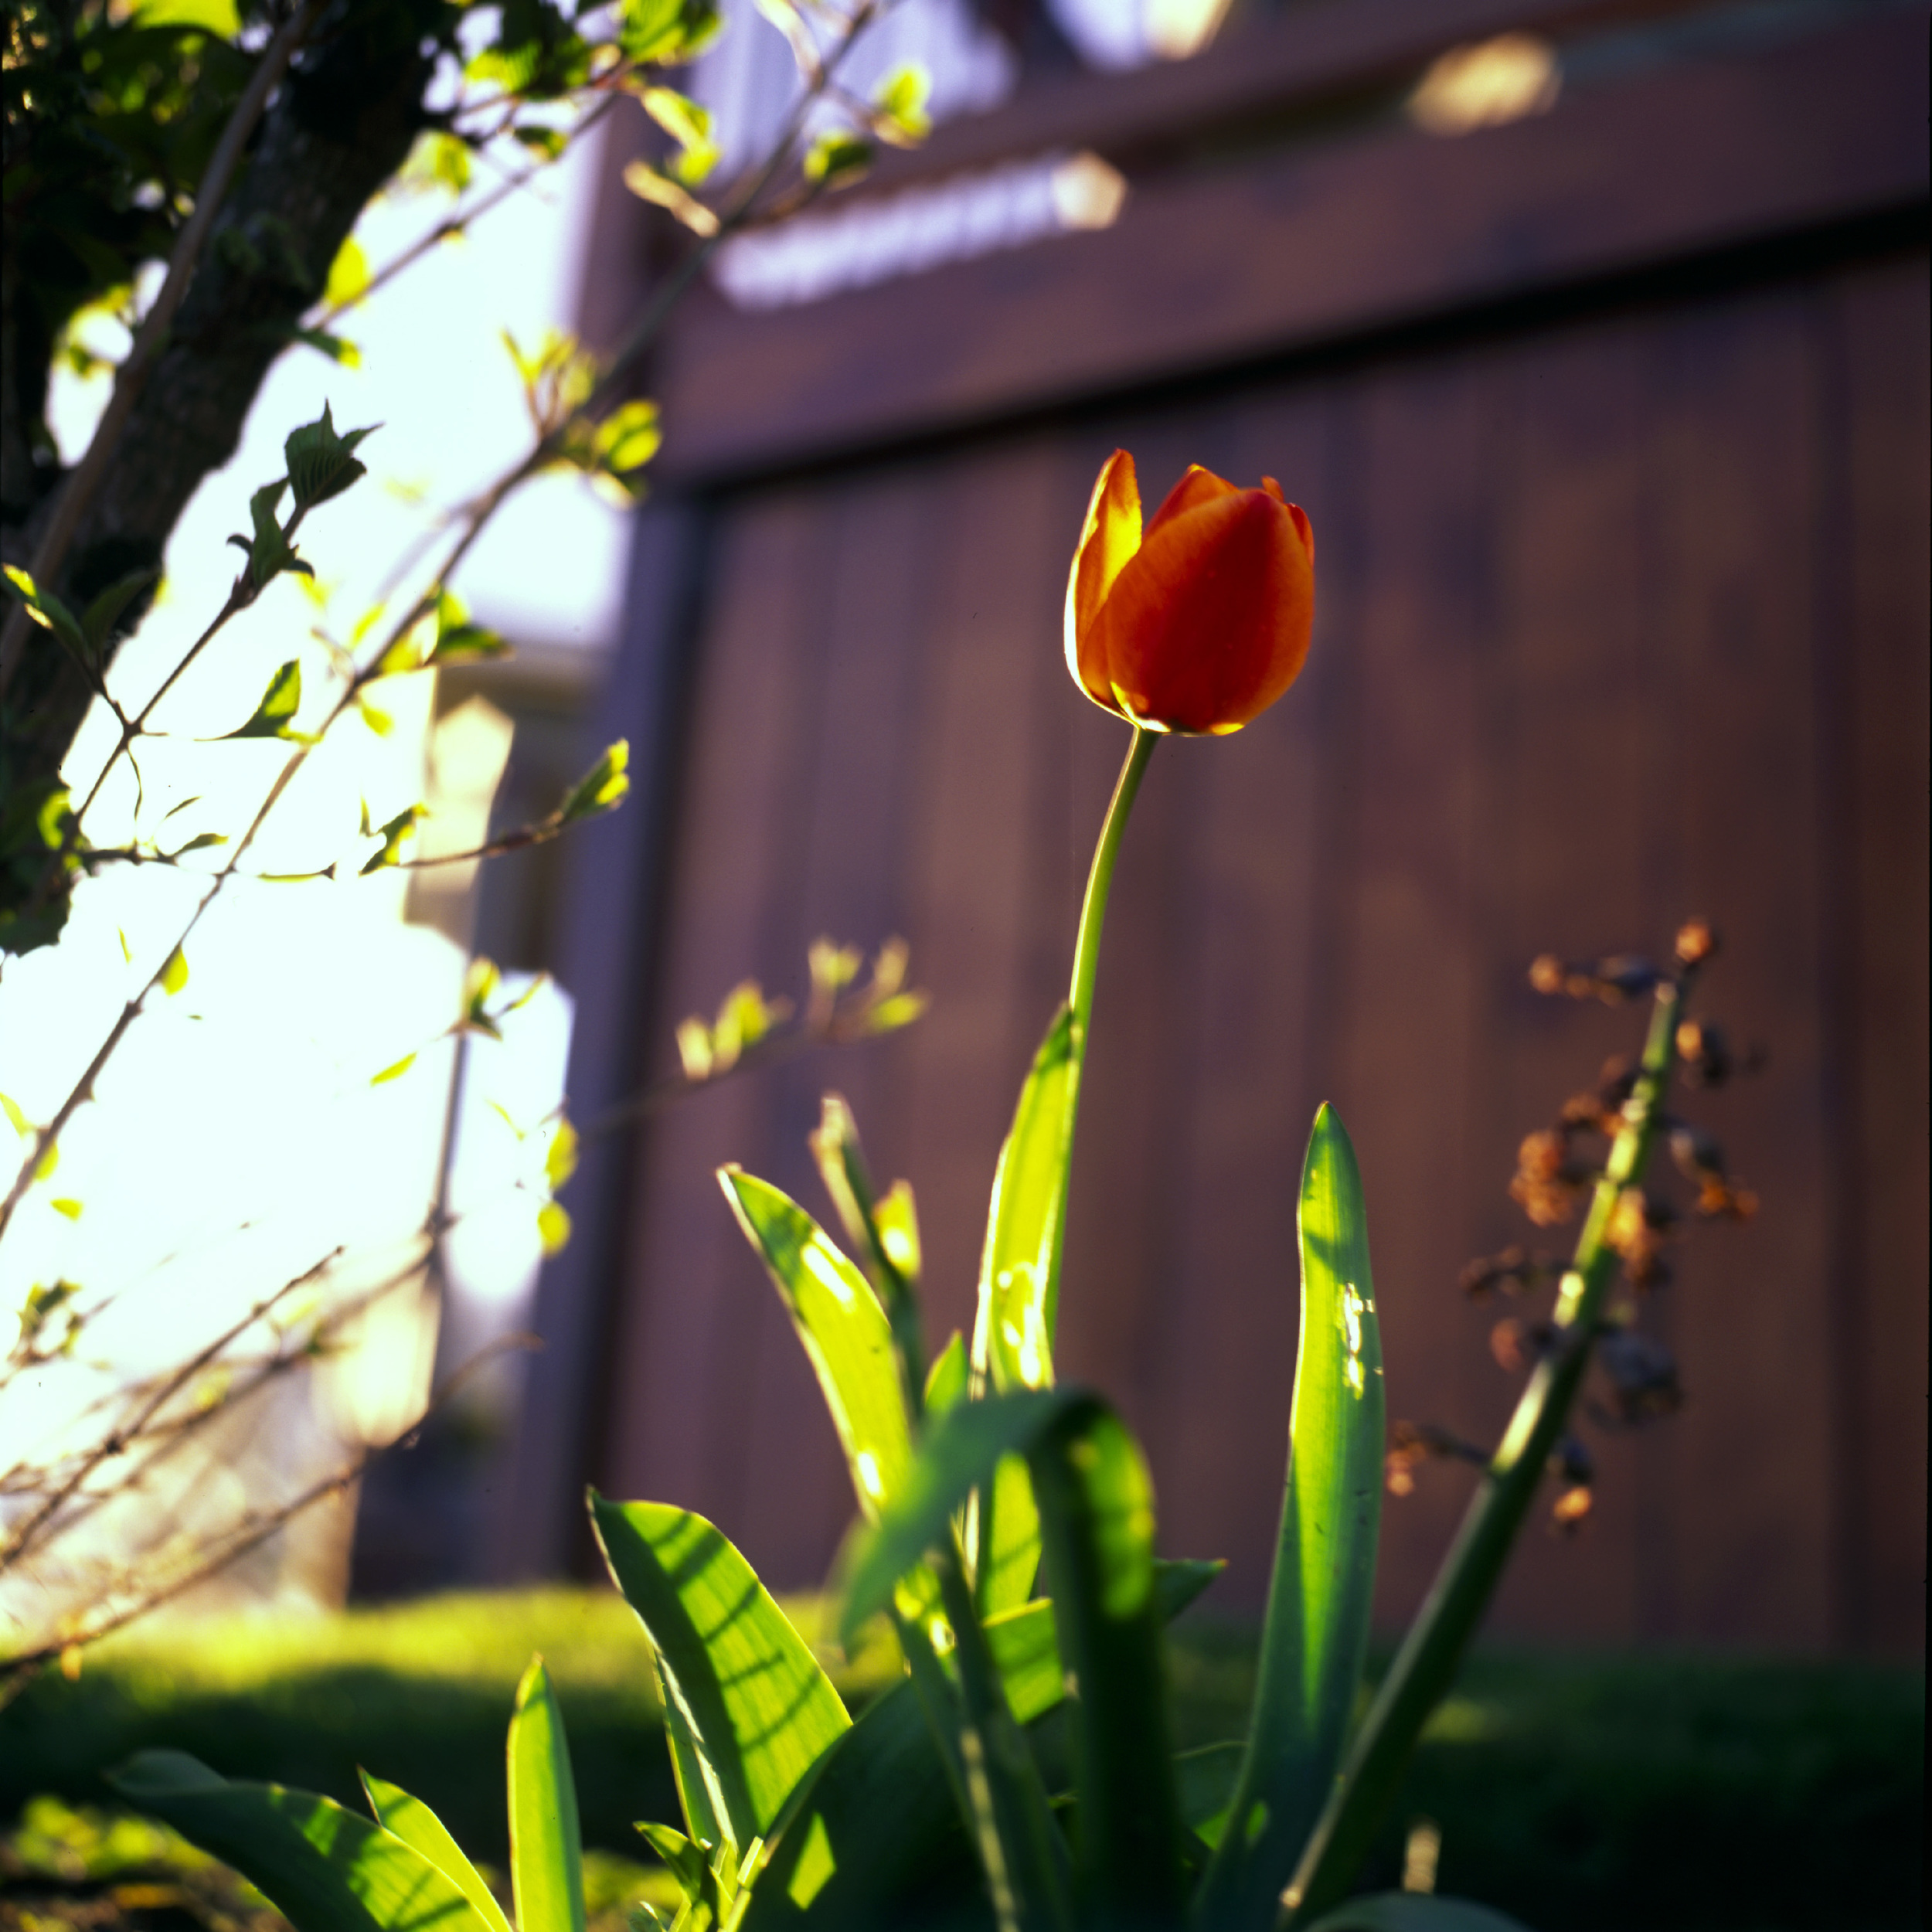 Tulip bathing in the golder hour sun.